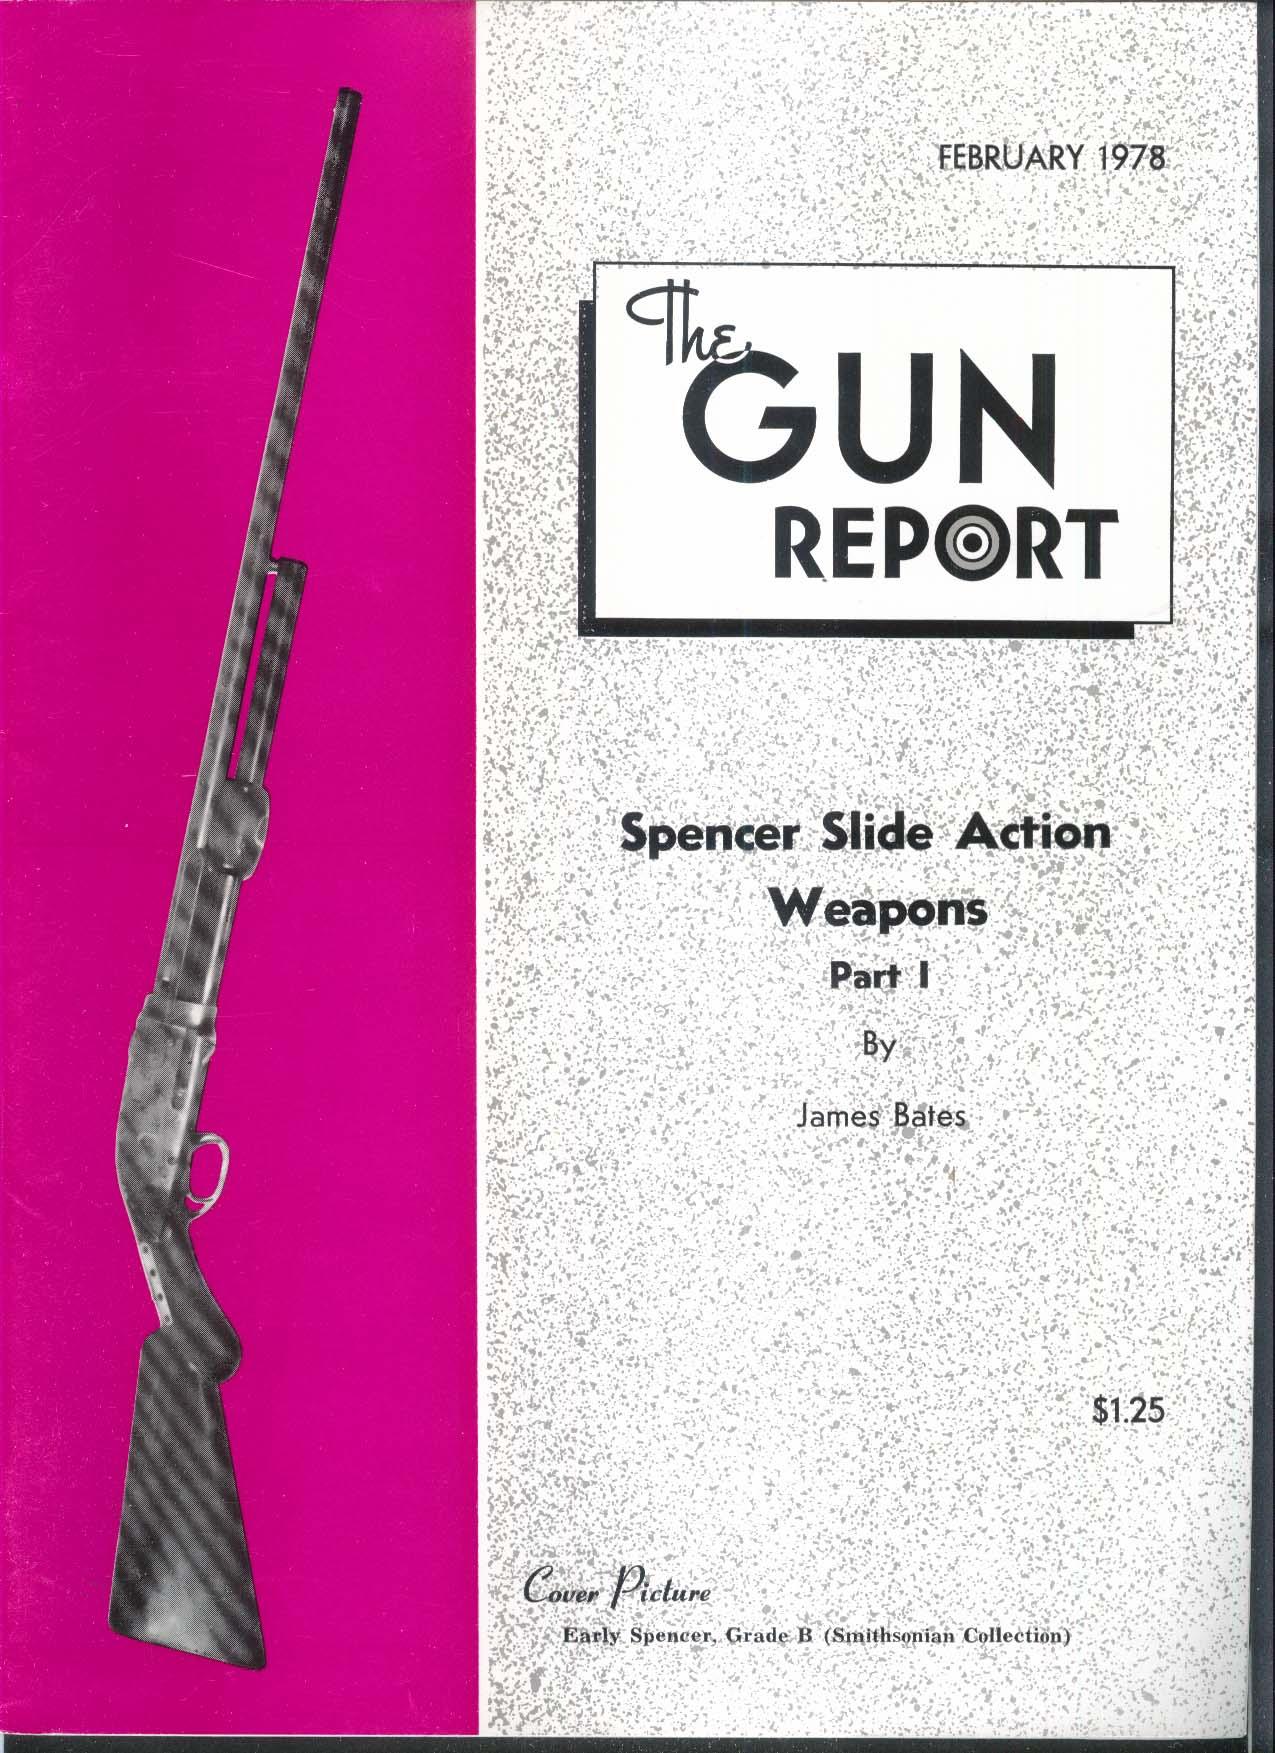 GUN REPORT Spencer Slide Action Weapons Colonel R C Kuhn Remington 2 1978